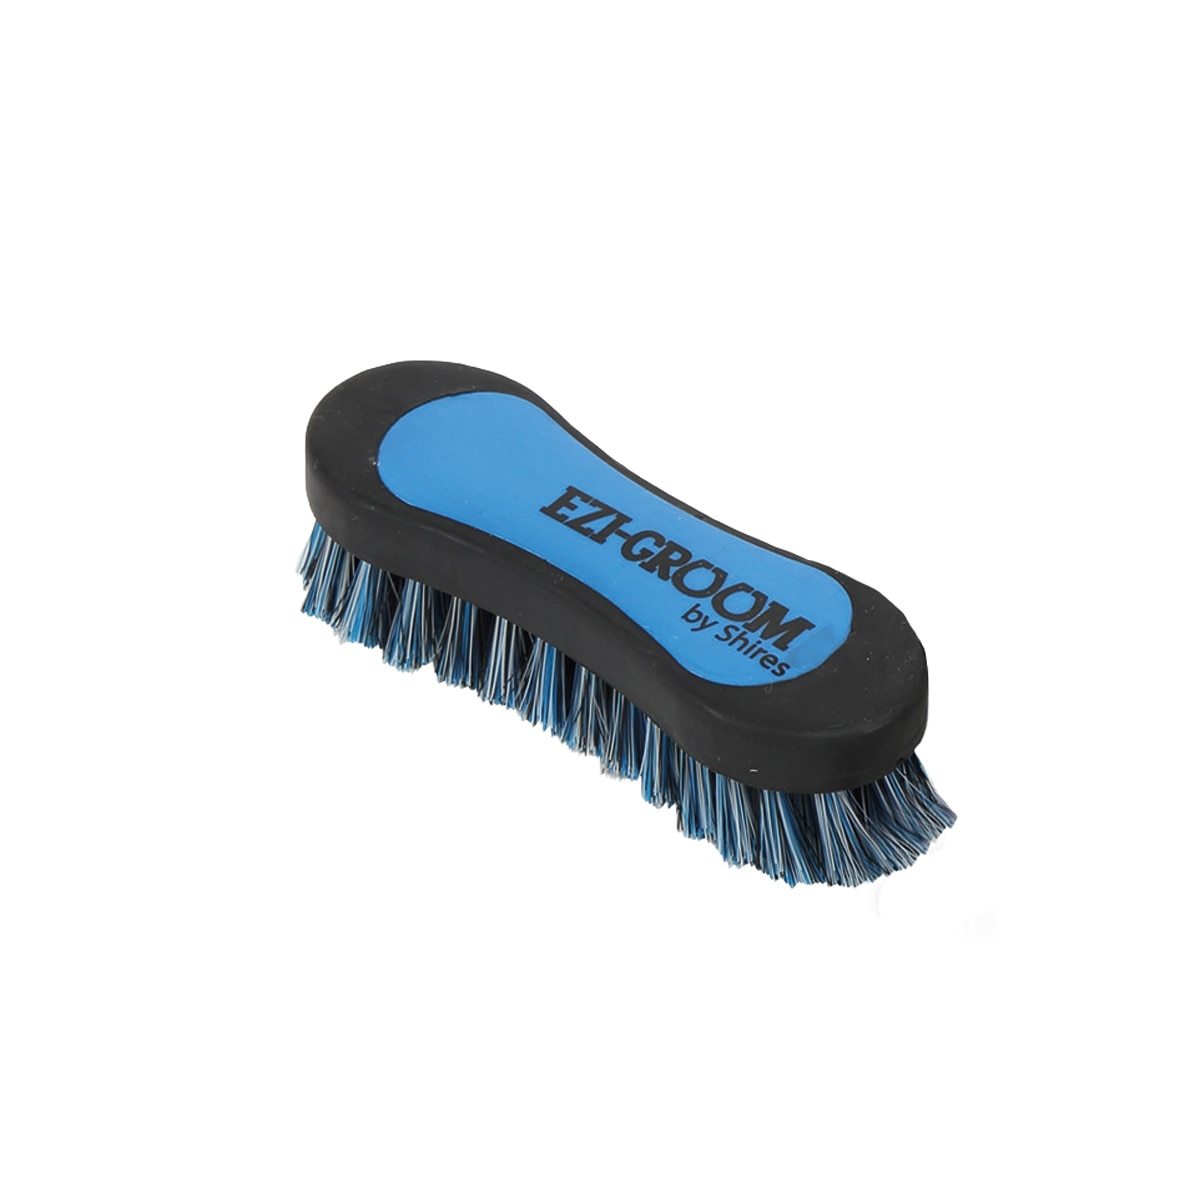 Shires Ezi-Groom Grip Face Soft Brush